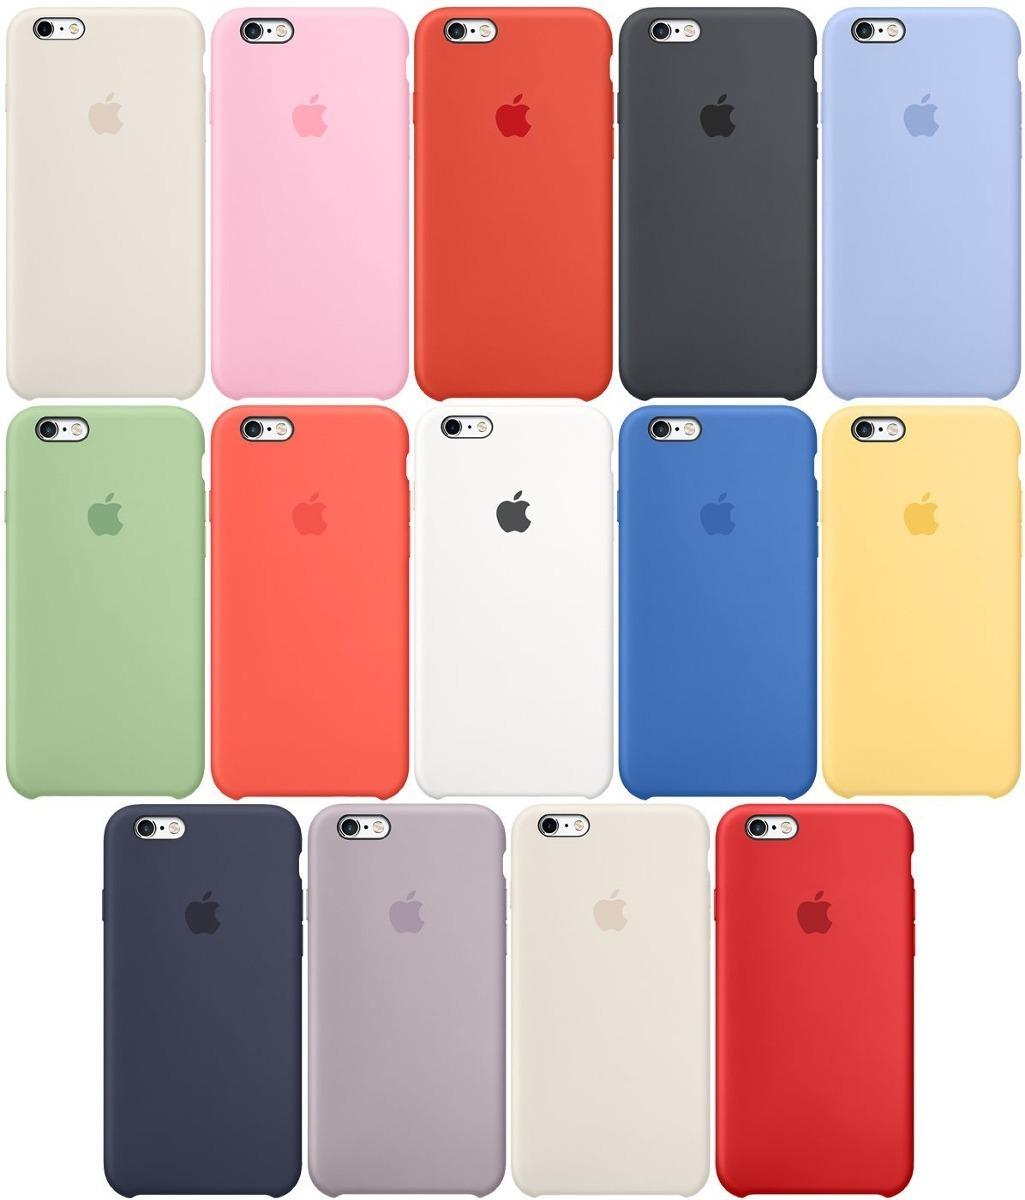 0aba0b302af Funda Para iPhone 8 Plus 7 Plus Silicona Soft - $ 499,00 en Mercado ...